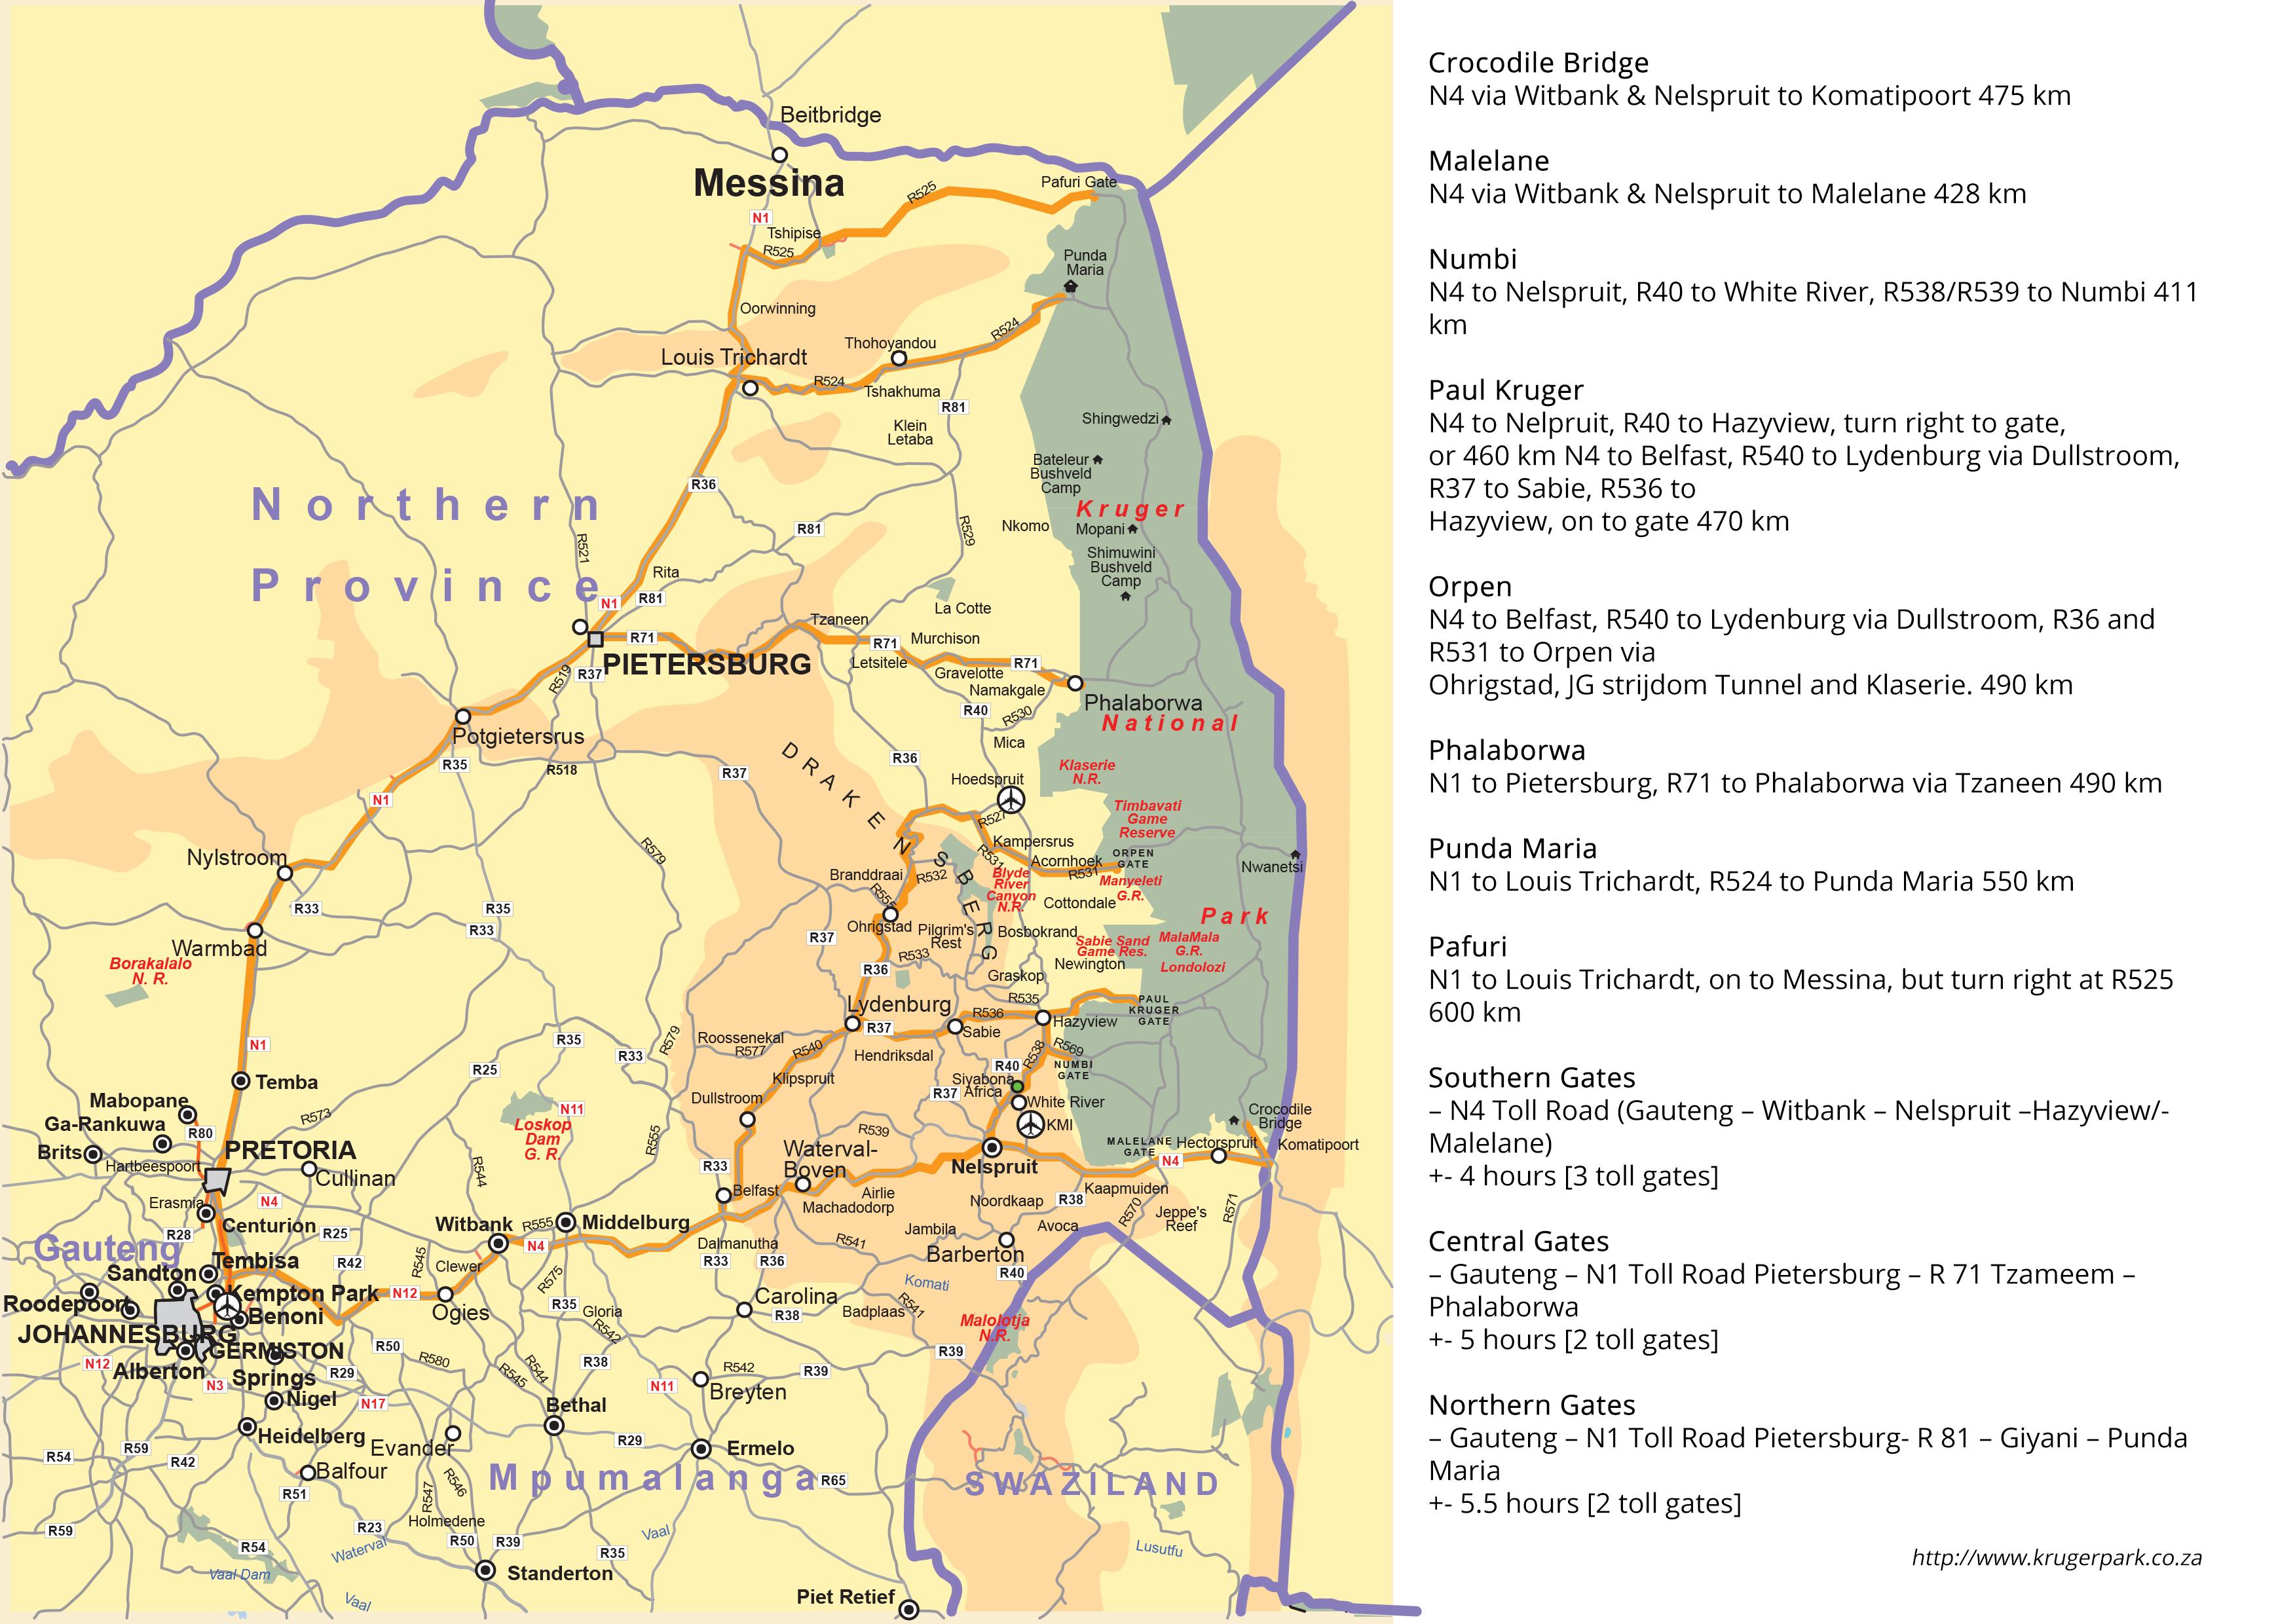 Hazyview Map | ShowMe Hazyview on sun city map, natal map, haarlem map, caprivi strip map, rio de janeiro map, brasov map, worcester map, sharm el sheikh map, london map, port elizabeth map, pietermaritzburg map, viterbo map, gauteng map, johannesburg map, arusha map, limpopo map, democratic republic of congo map, lviv map, cape town map, garden route map,